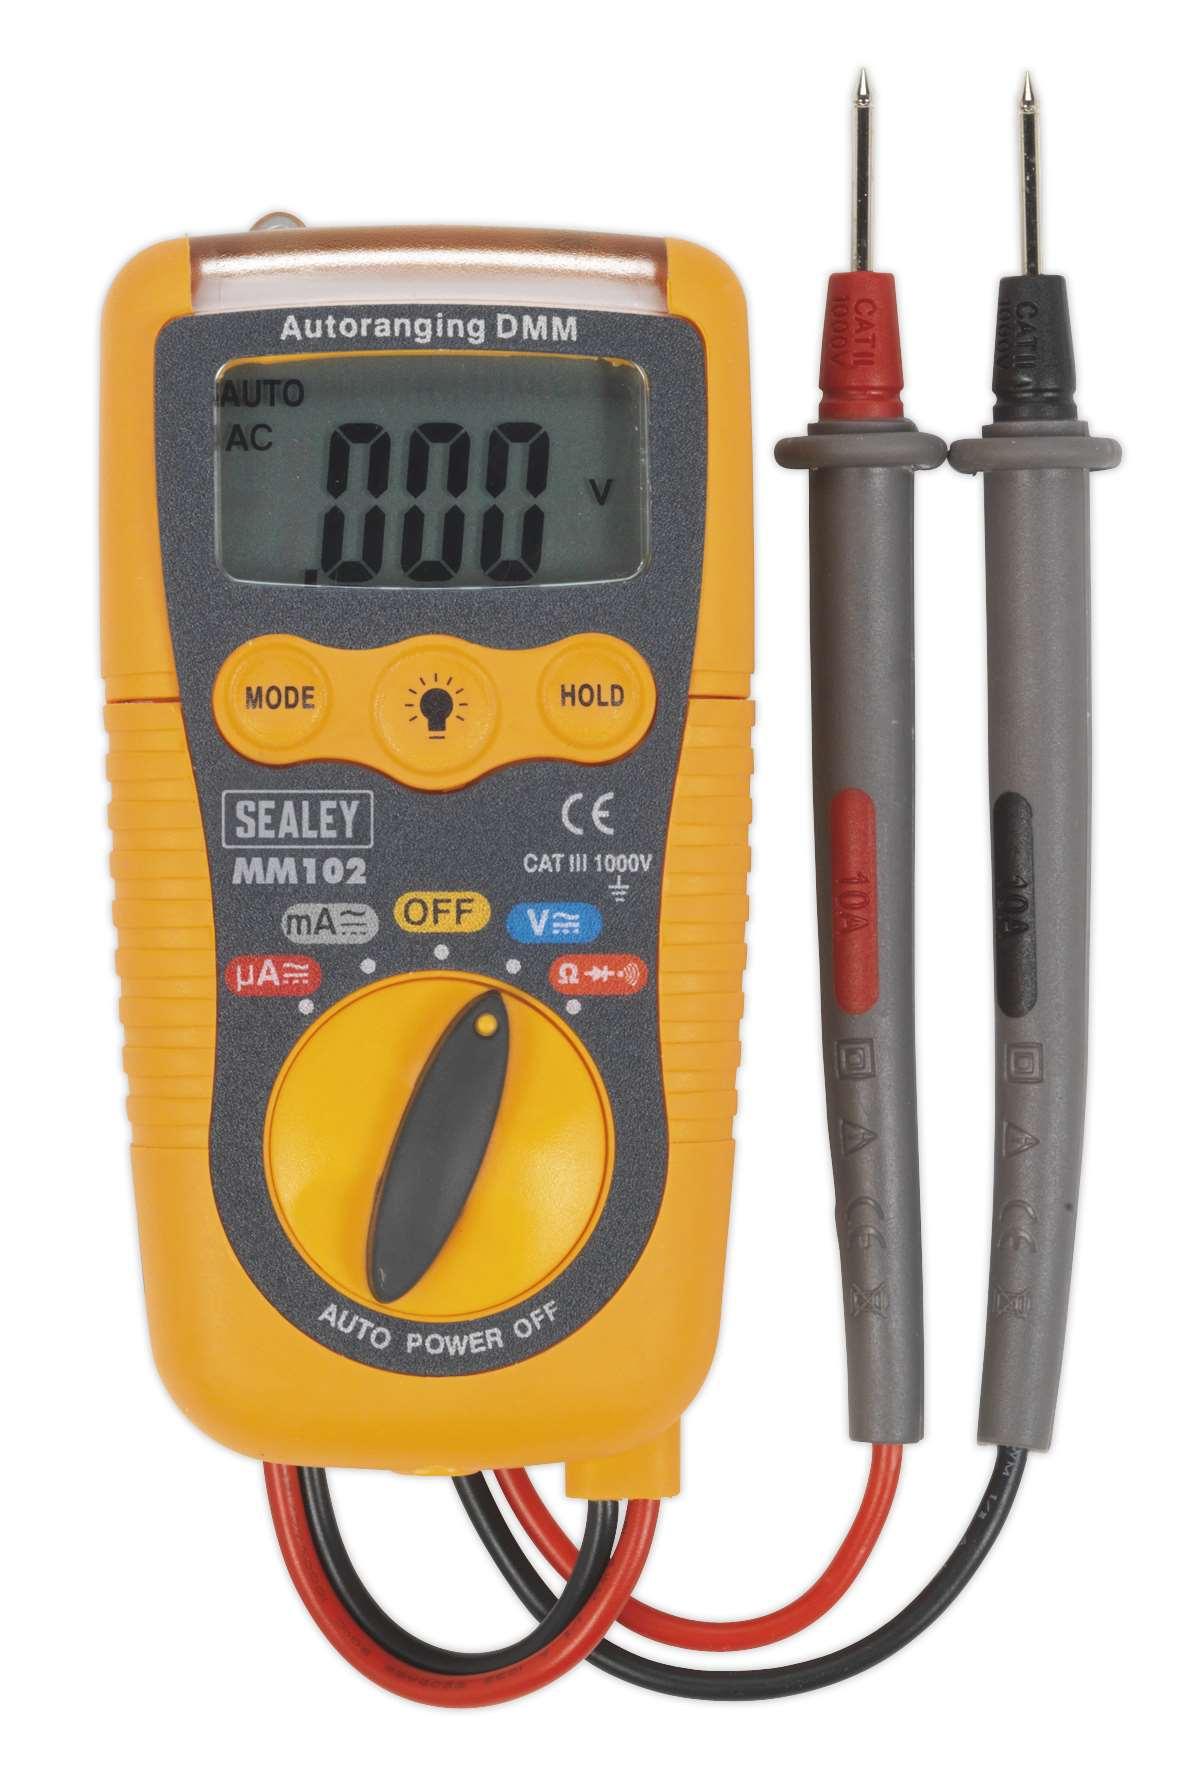 Alphatek TEK471 Measures Frequency And Temperature With Type K Temperature Probe 20 Amp Digital Backlit LCD 1000 Volt AC//DC High Performance Digital Multimeter